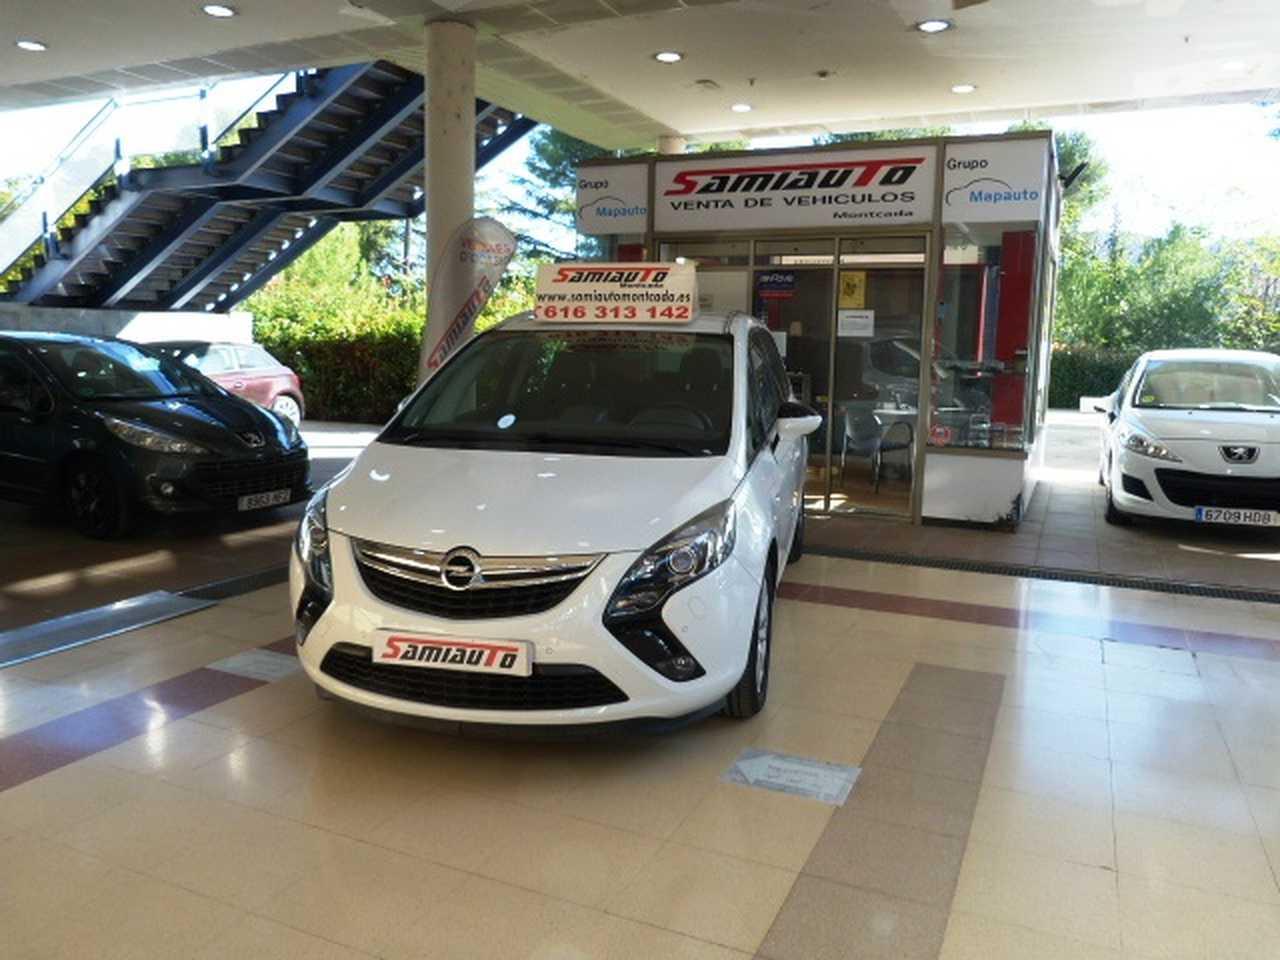 Opel Zafira  Tourer     Tourer 1.6 CDTi SS 136 CV Excellence 5p  MUY MUY BIEN CUIDADO KILÓMETROS CERTIFICADOS  - Foto 1